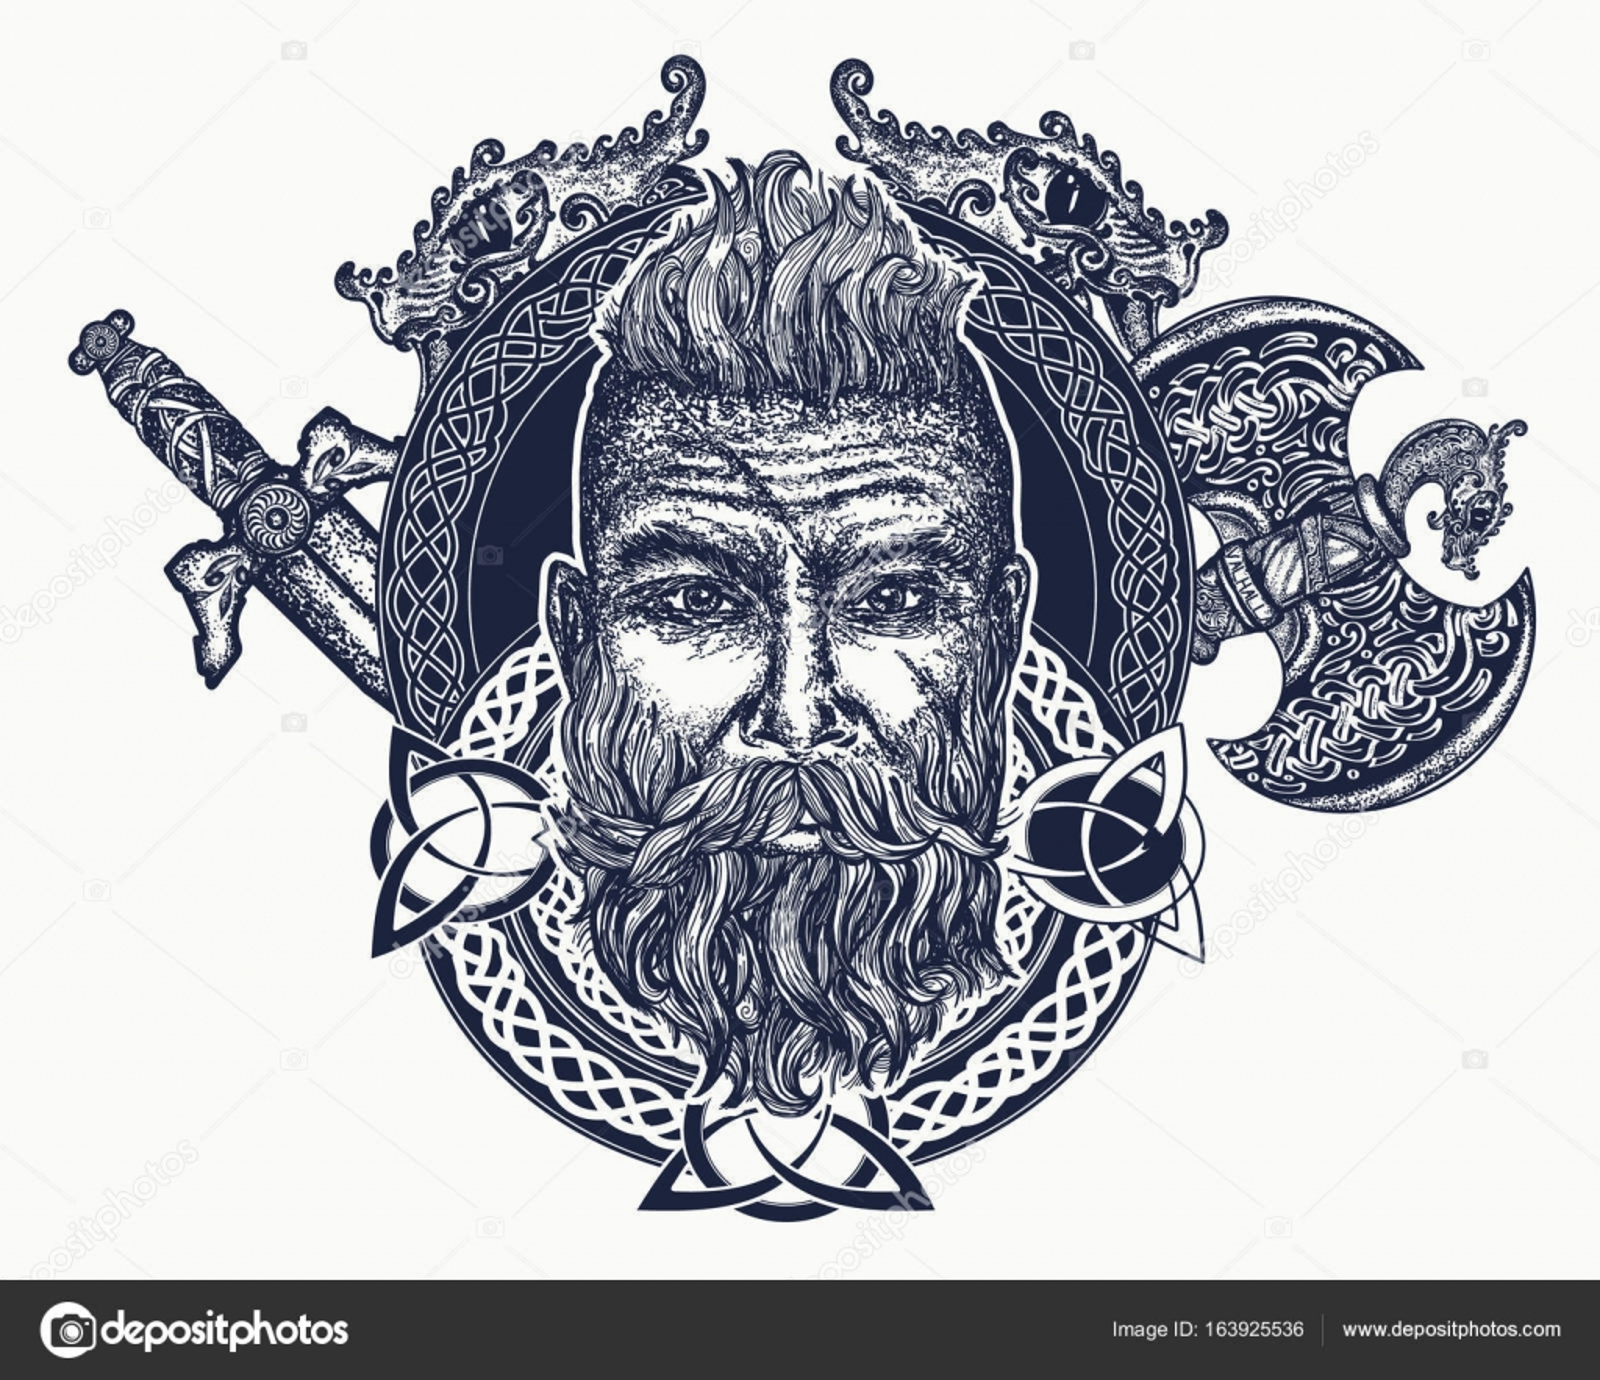 Tatuaje De Vikingo Símbolo De Fuerza Coraje Mitología Nórdica